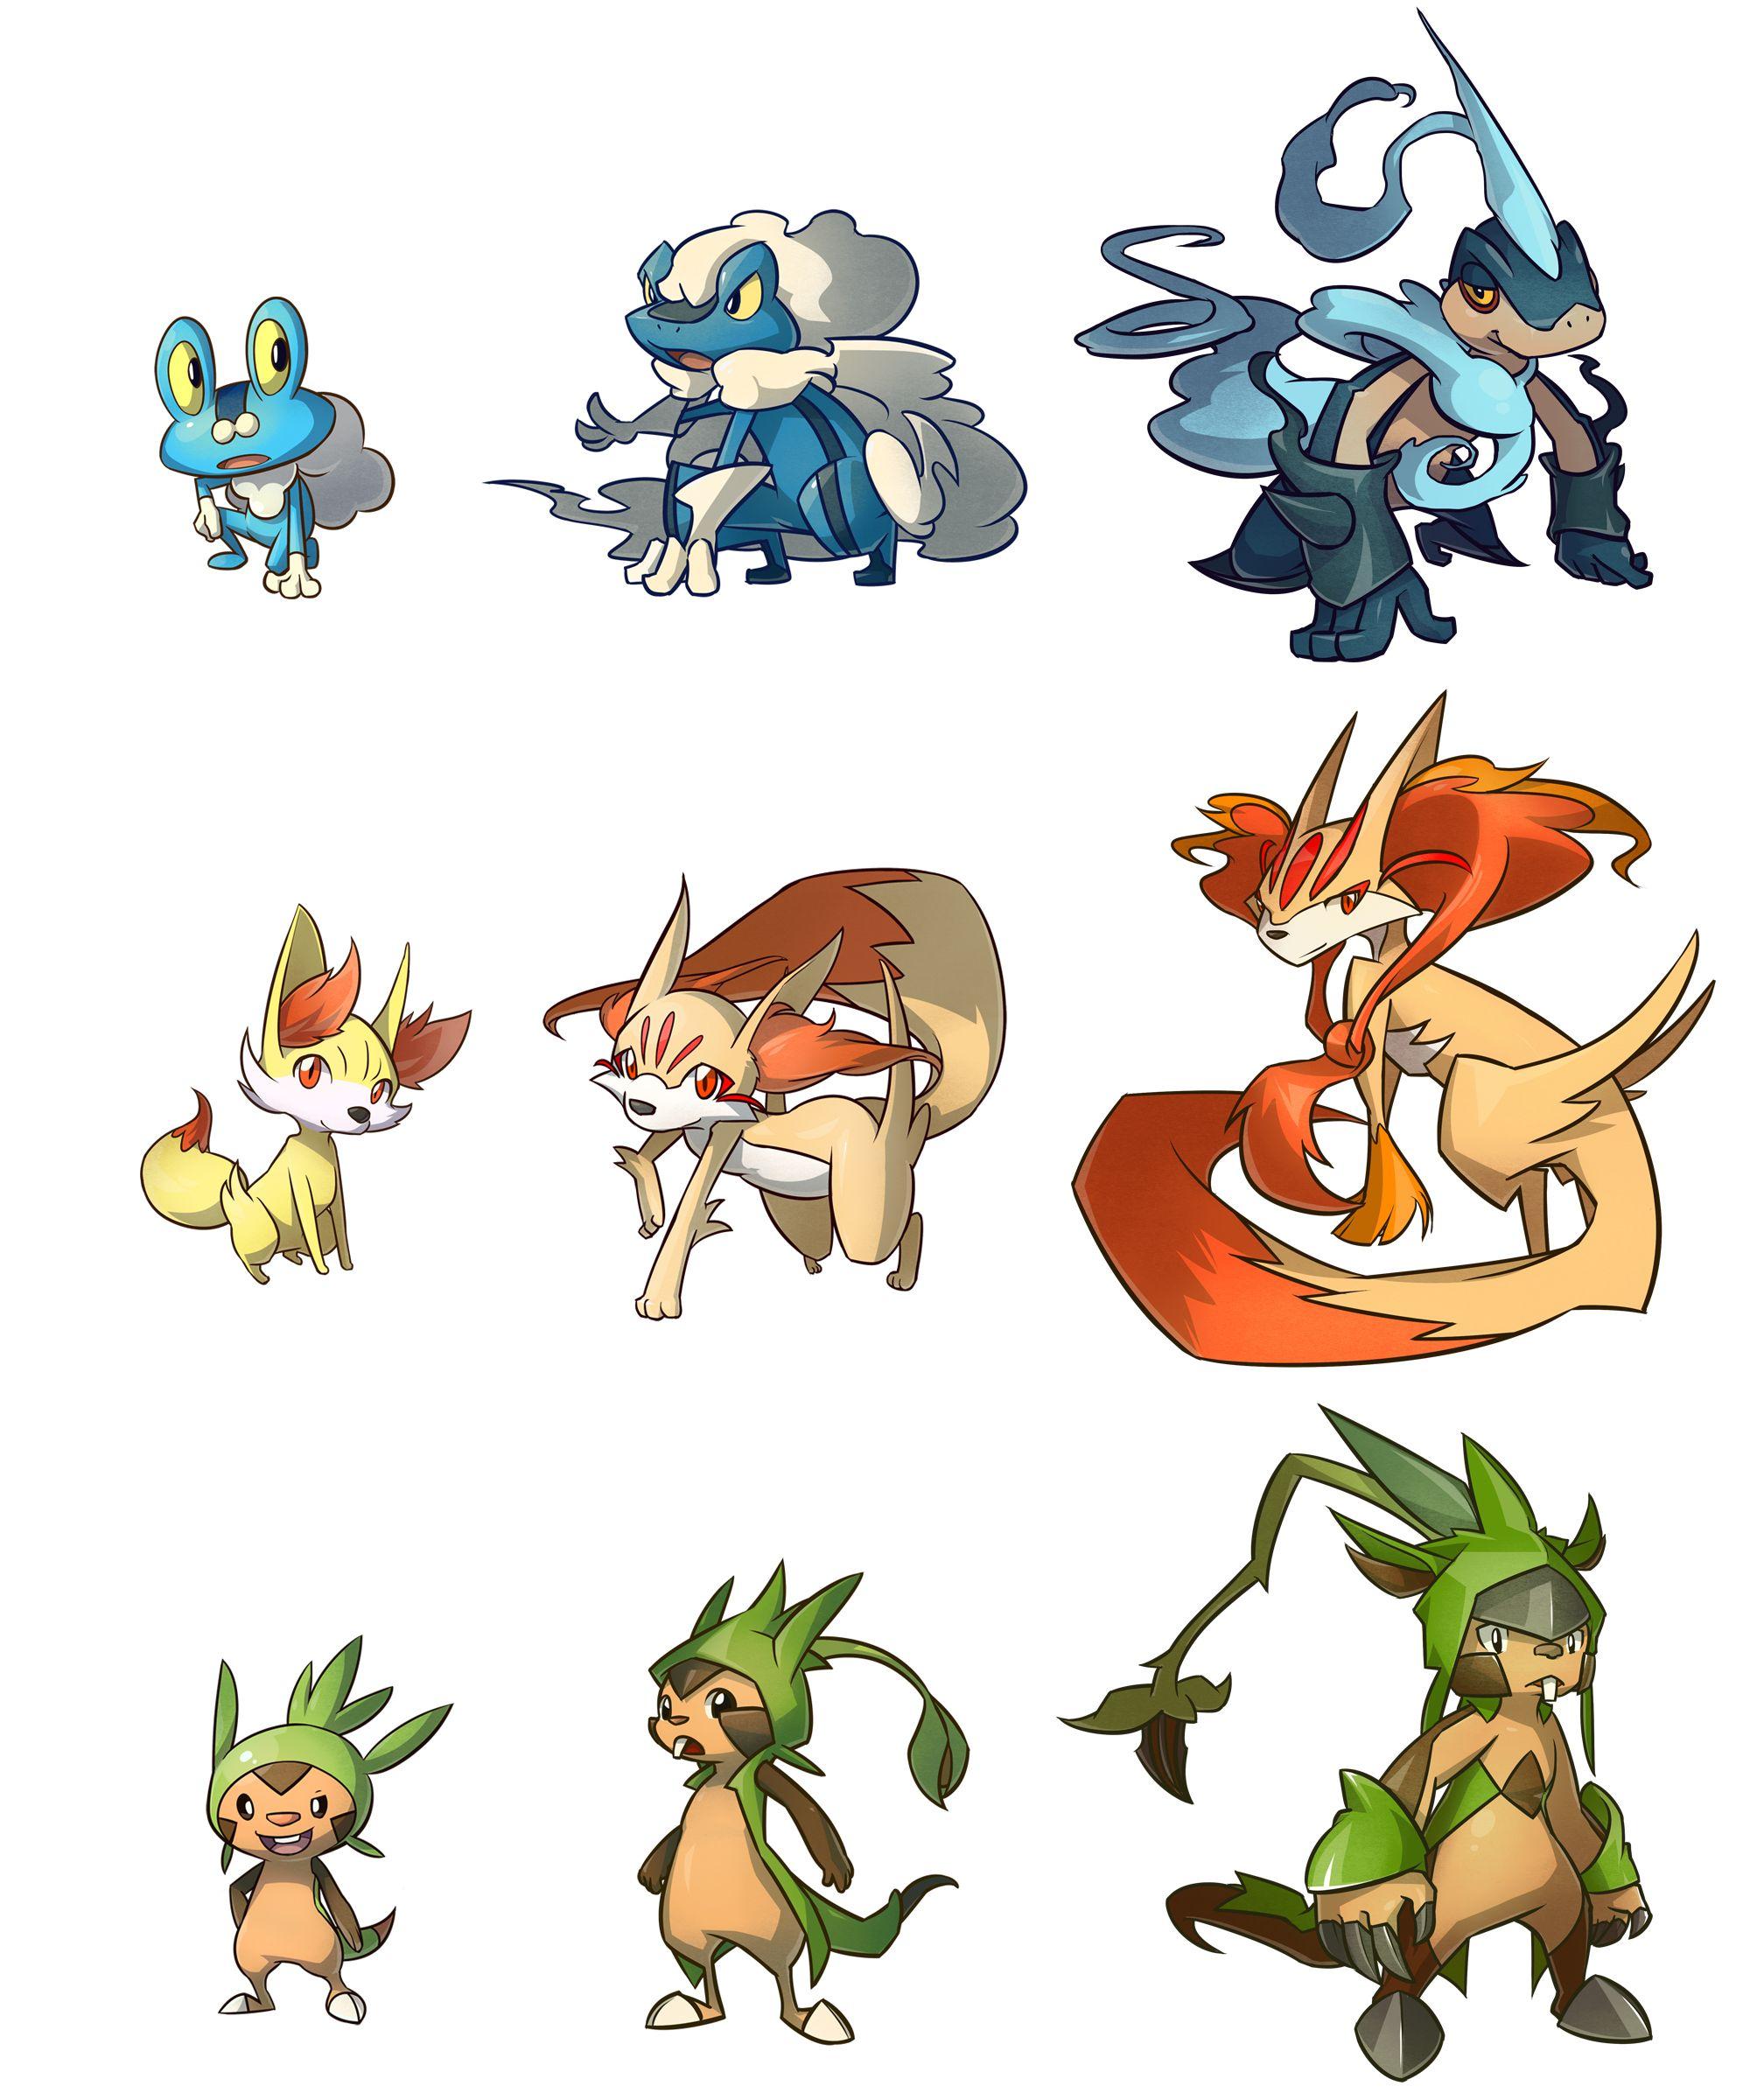 Pok mon 1398719 zerochan pok mon pinterest pok mon dessin pokemon and dessin - Dessins pokemon ...